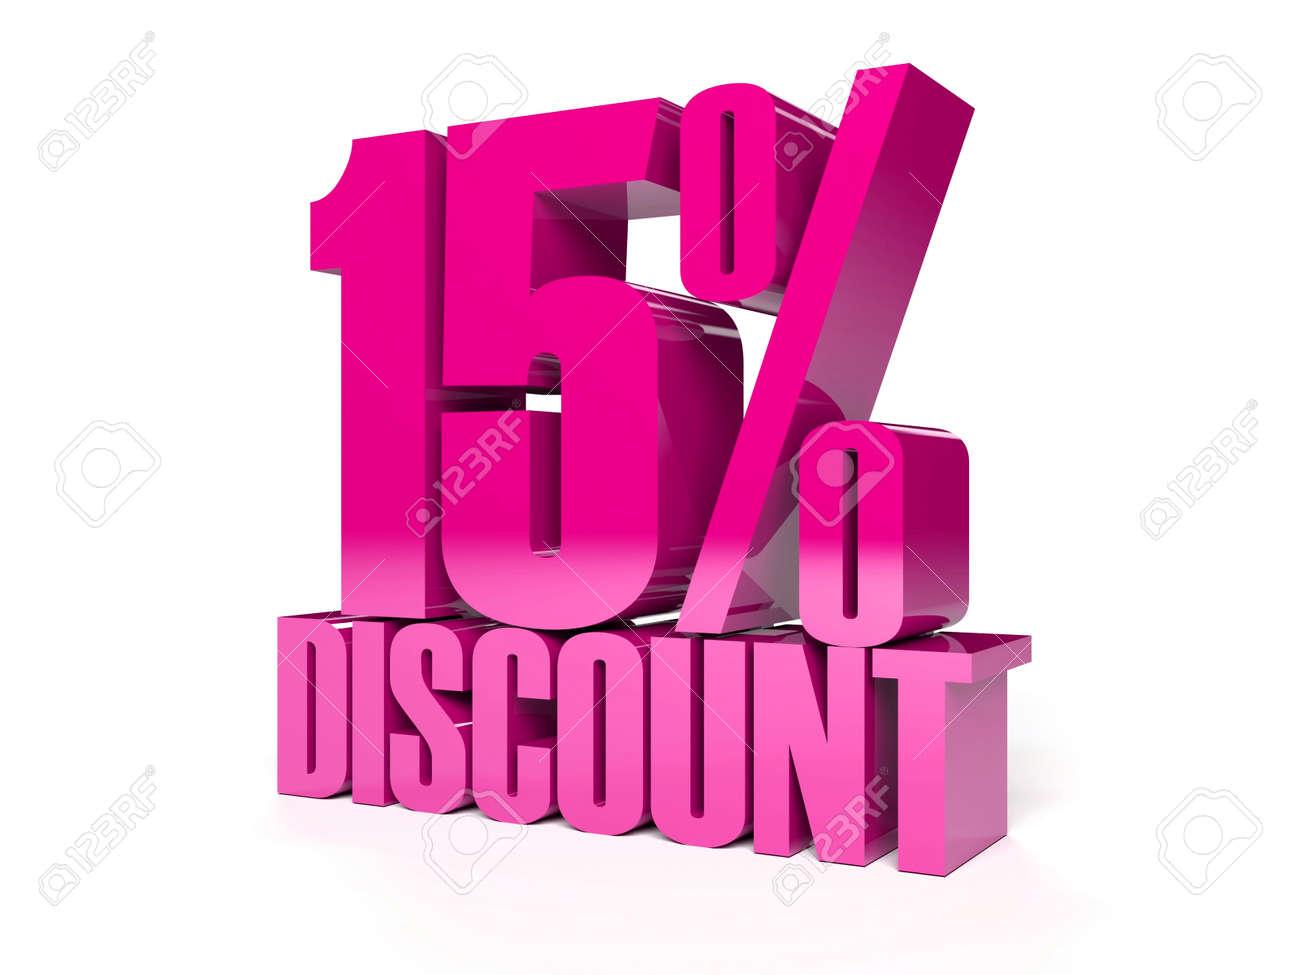 15 percent discount. Pink shiny text. Concept 3D illustration. Stock Illustration - 22491819